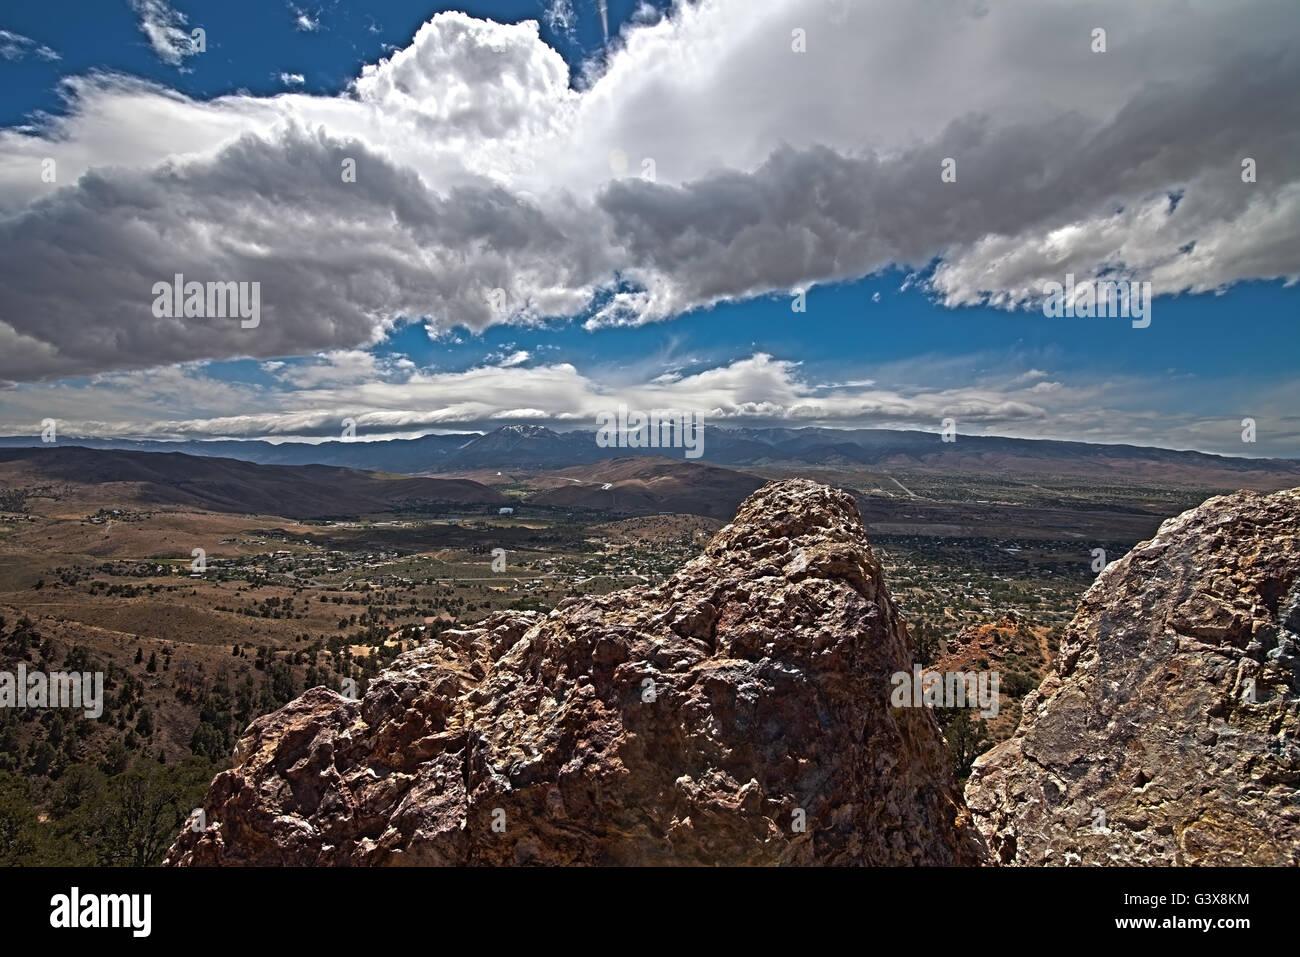 Cloudy blue skyline of Mt. Rose. Reno, Nevada Washoe Valley. Sierra mountain - Stock Image